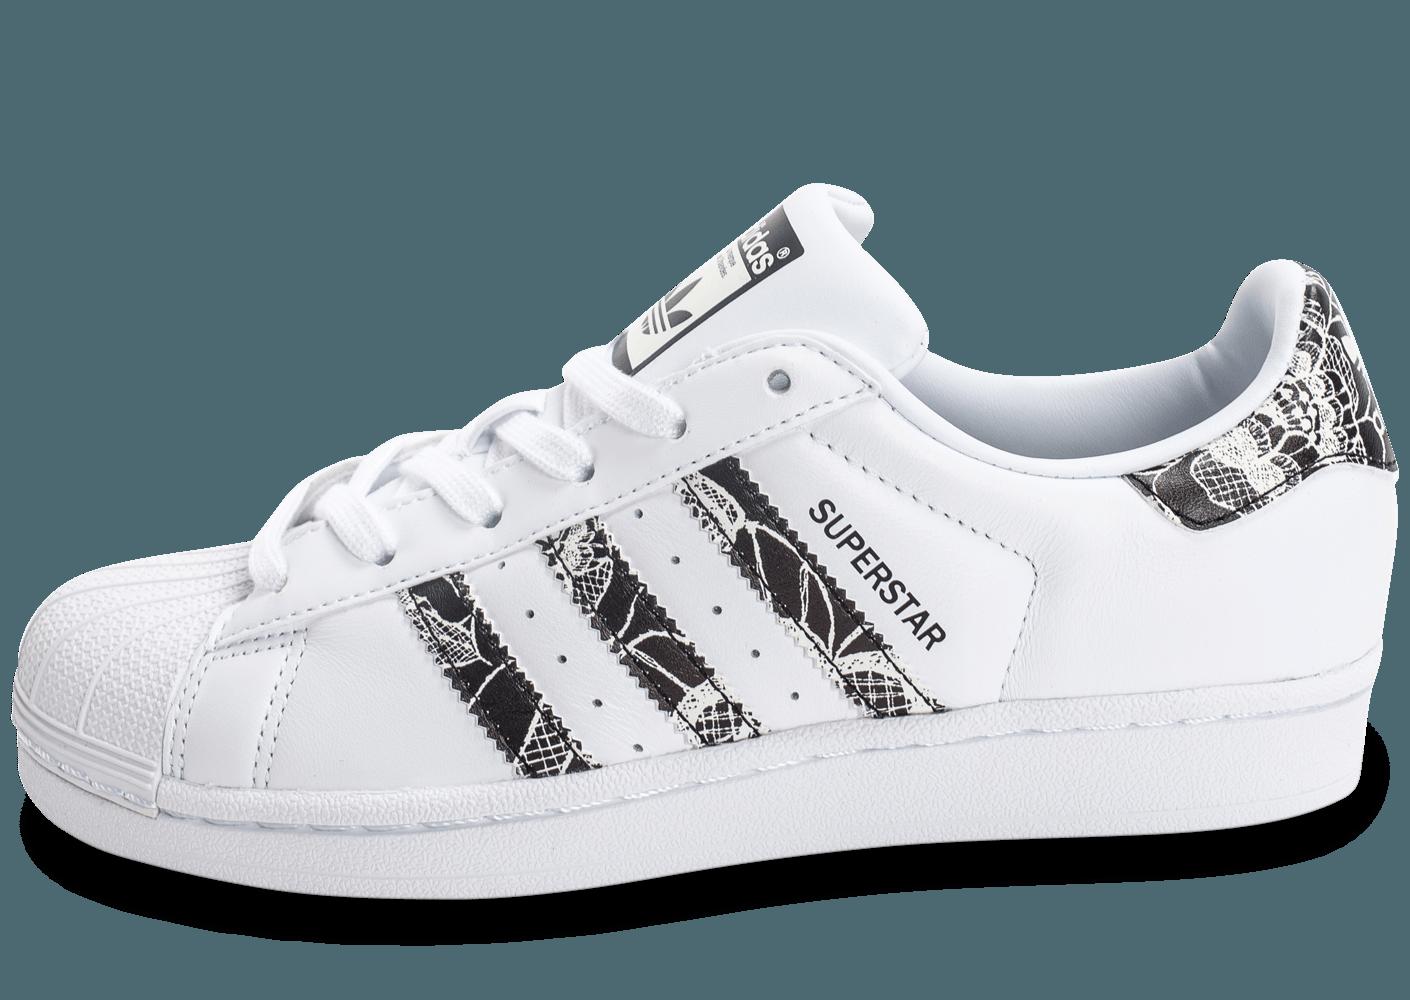 Retrouvez les Chaussures adidas Superstar Farm Company Print